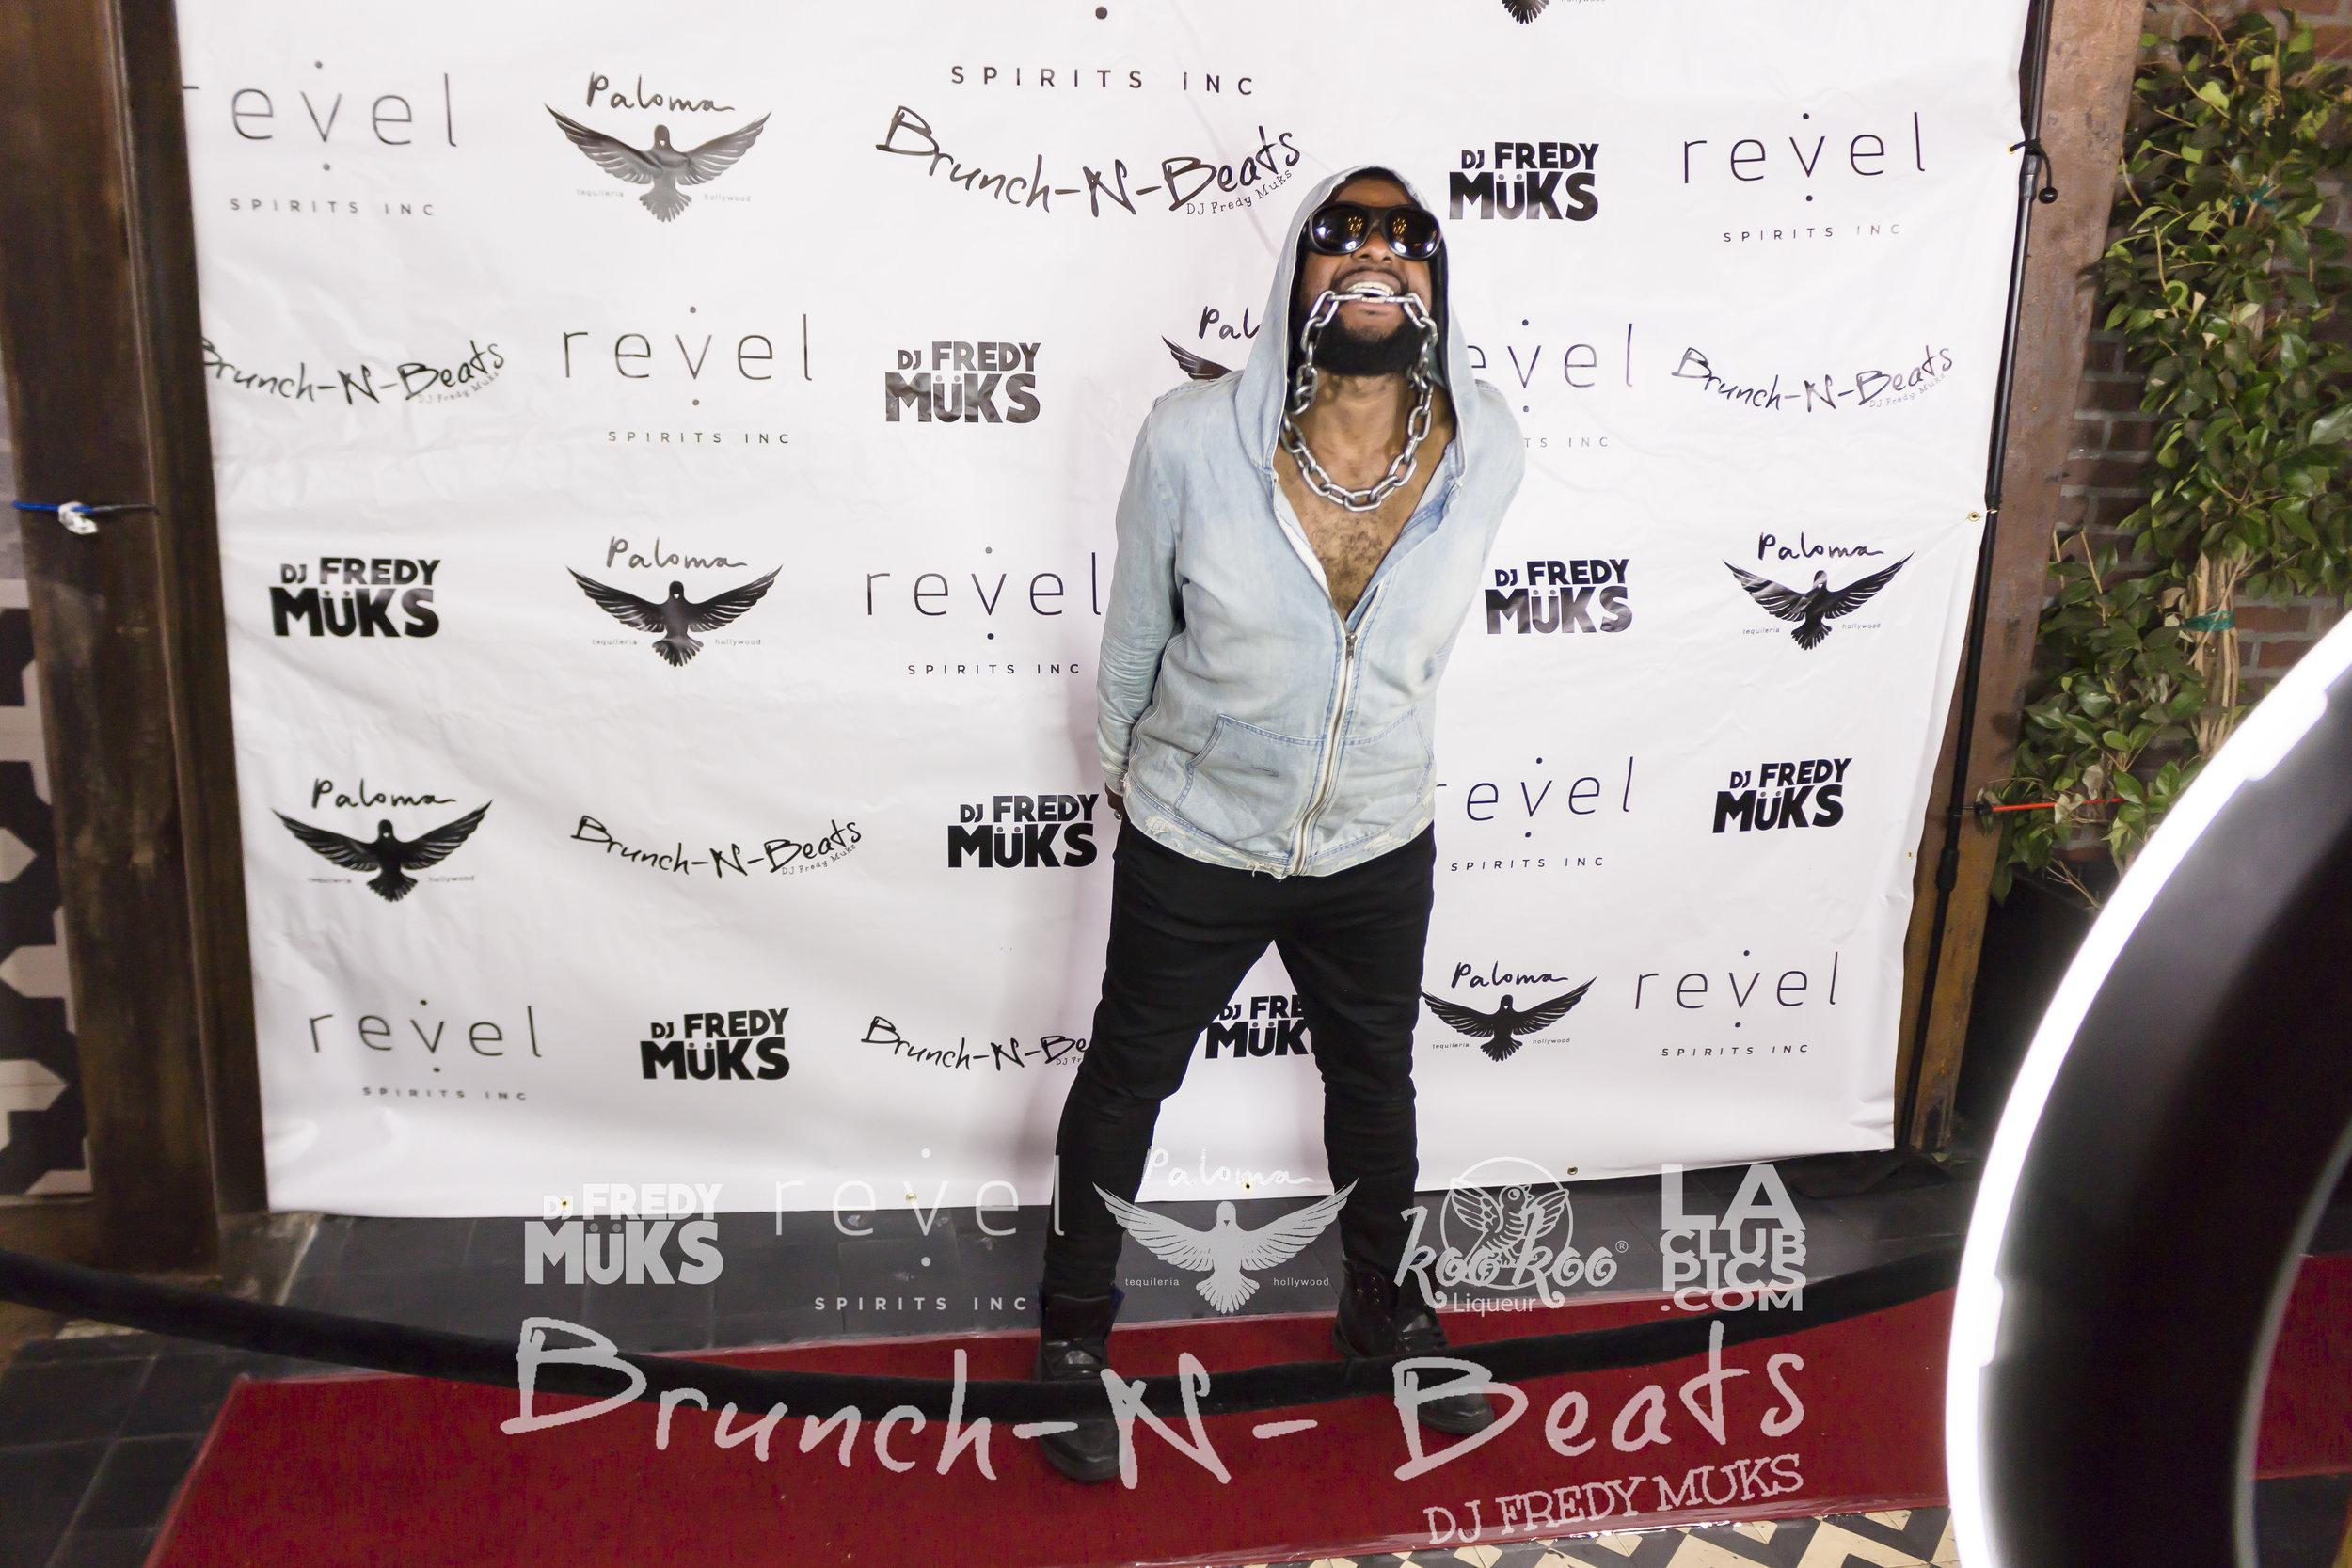 Brunch-N-Beats - 03-11-18_171.jpg